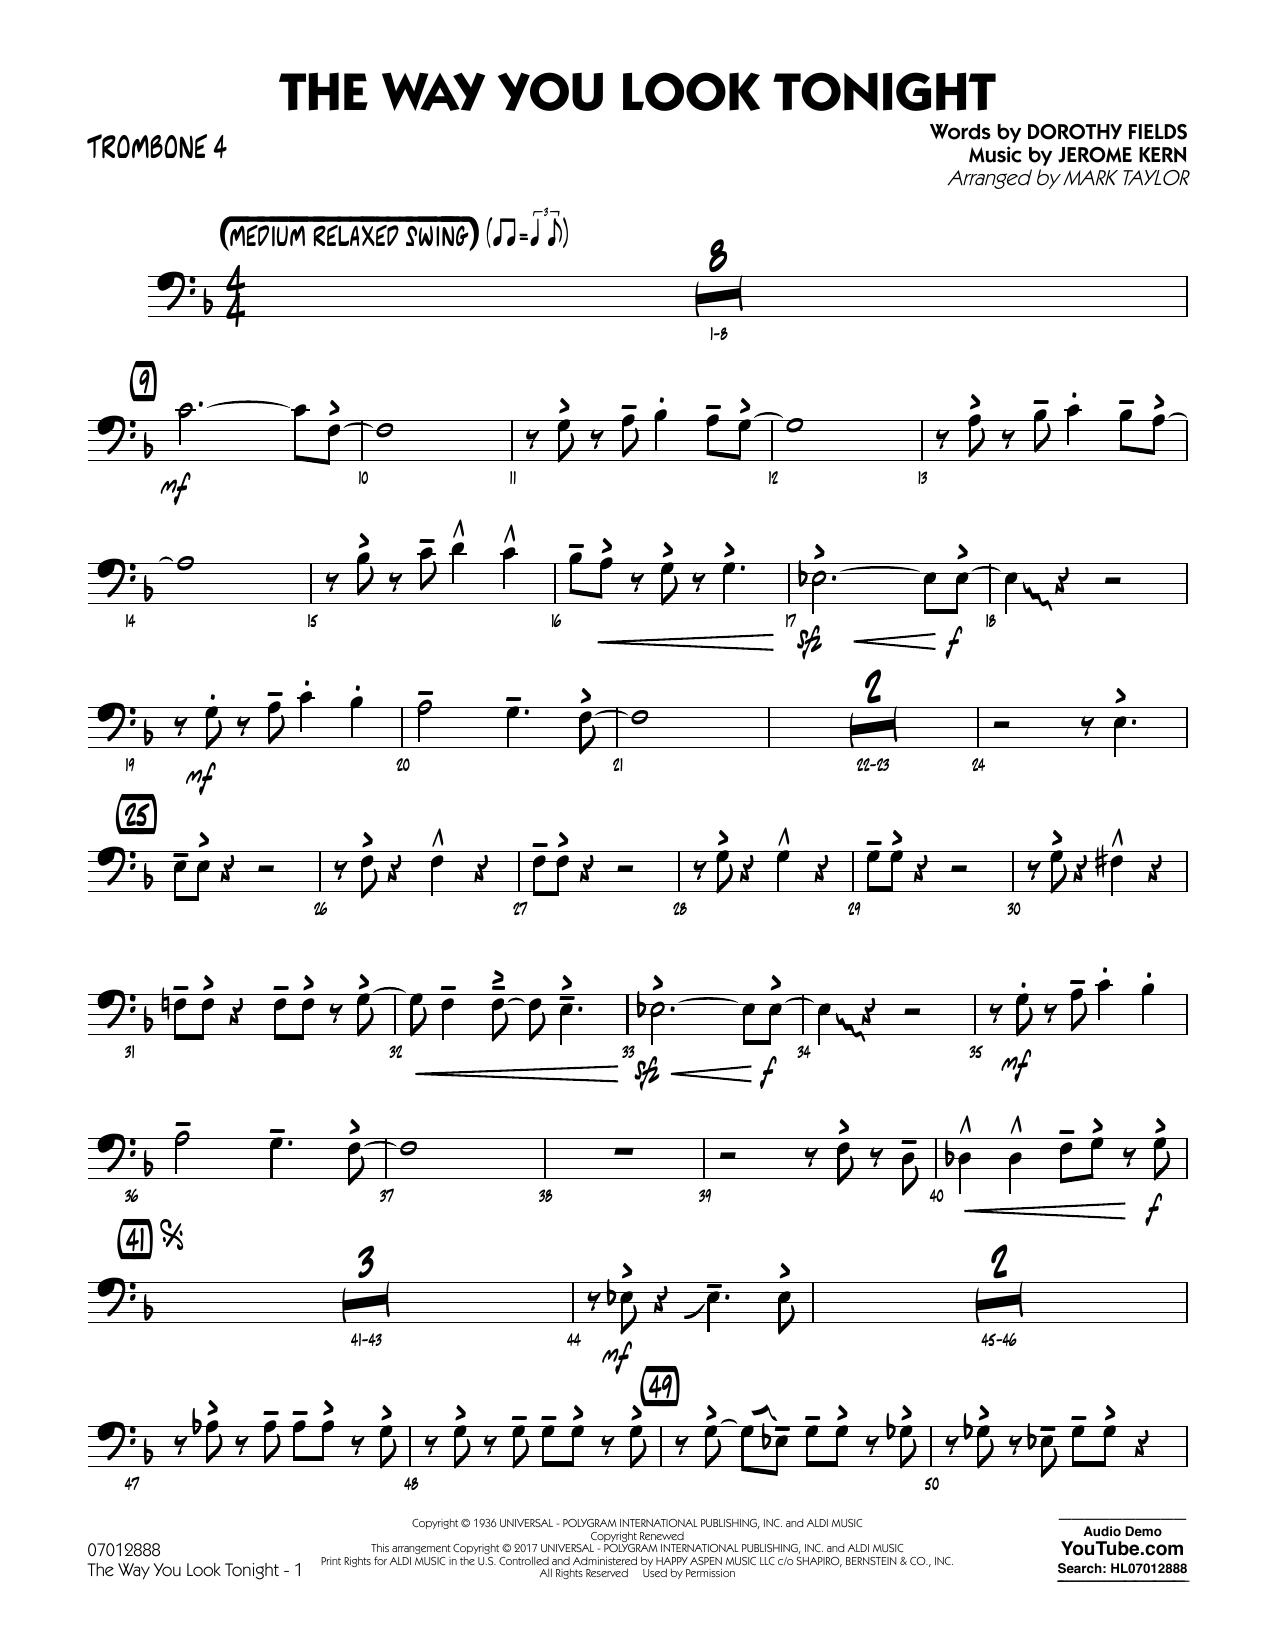 The Way You Look Tonight - Trombone 4 (Jazz Ensemble)